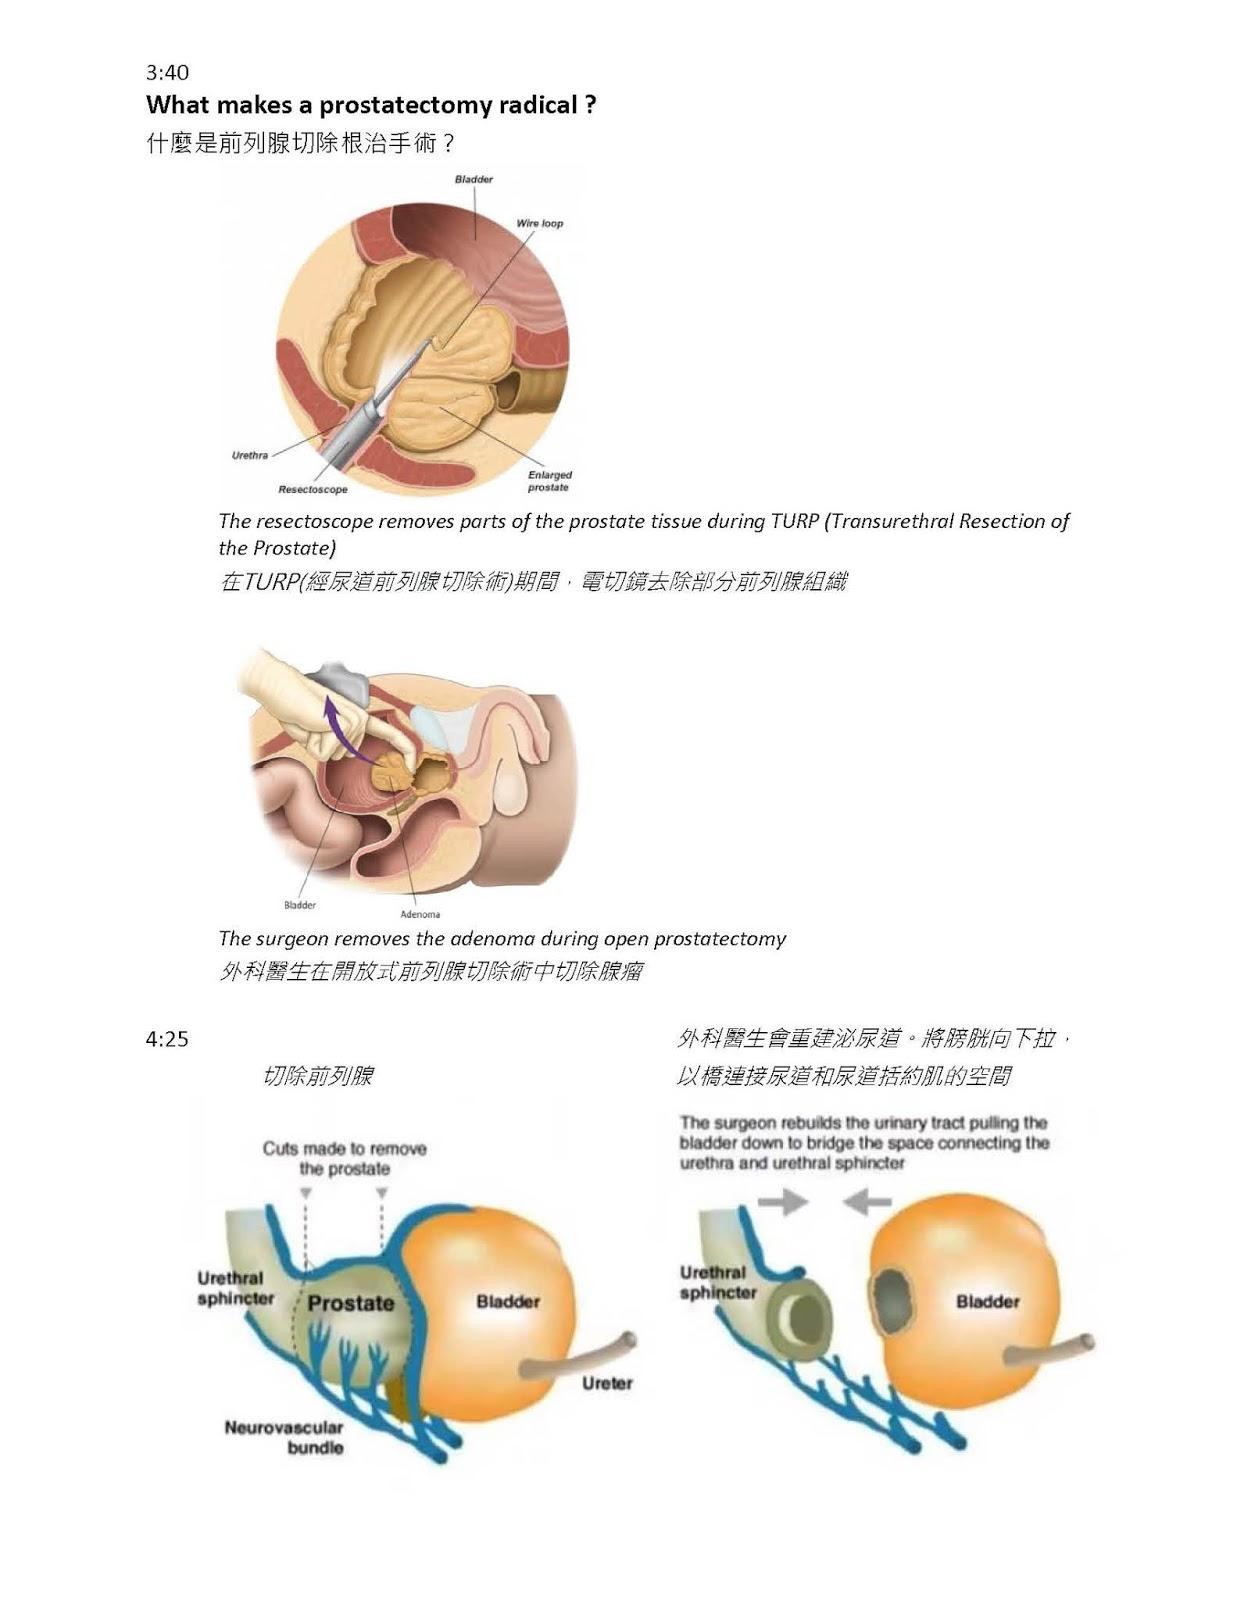 Richmond Chinese Prostate Cancer Support Group 列治文華人前列腺癌支援網絡: Radical Prostatectomy for Prostate Cancer (前列腺切除 ...